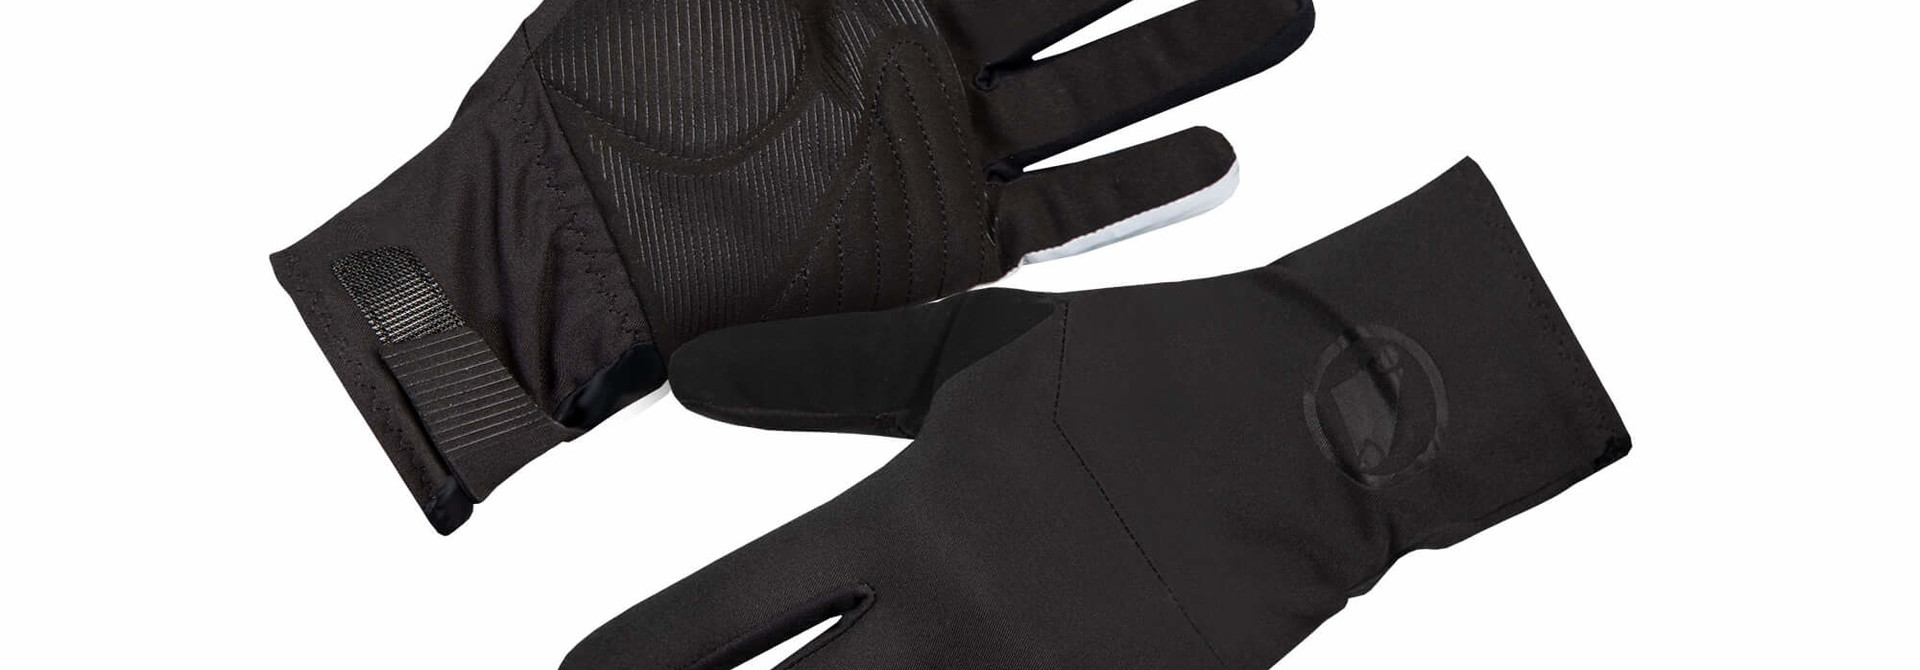 Deluge Glove